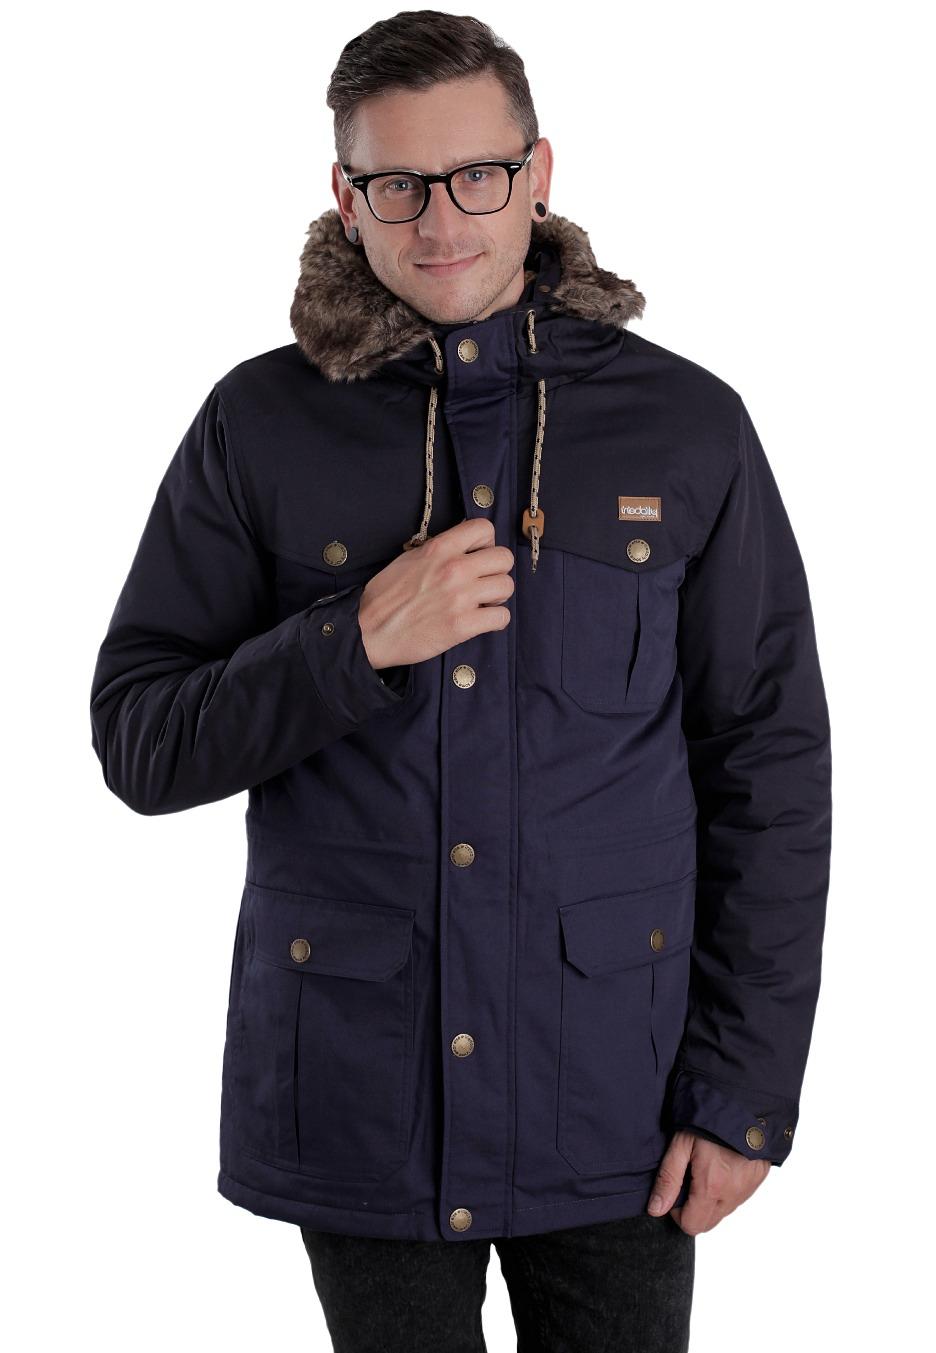 Iriedaily - Eissegler Parka Navy - Bunda - Streetwear obchod -  Impericon.com CZ SK cca132771b